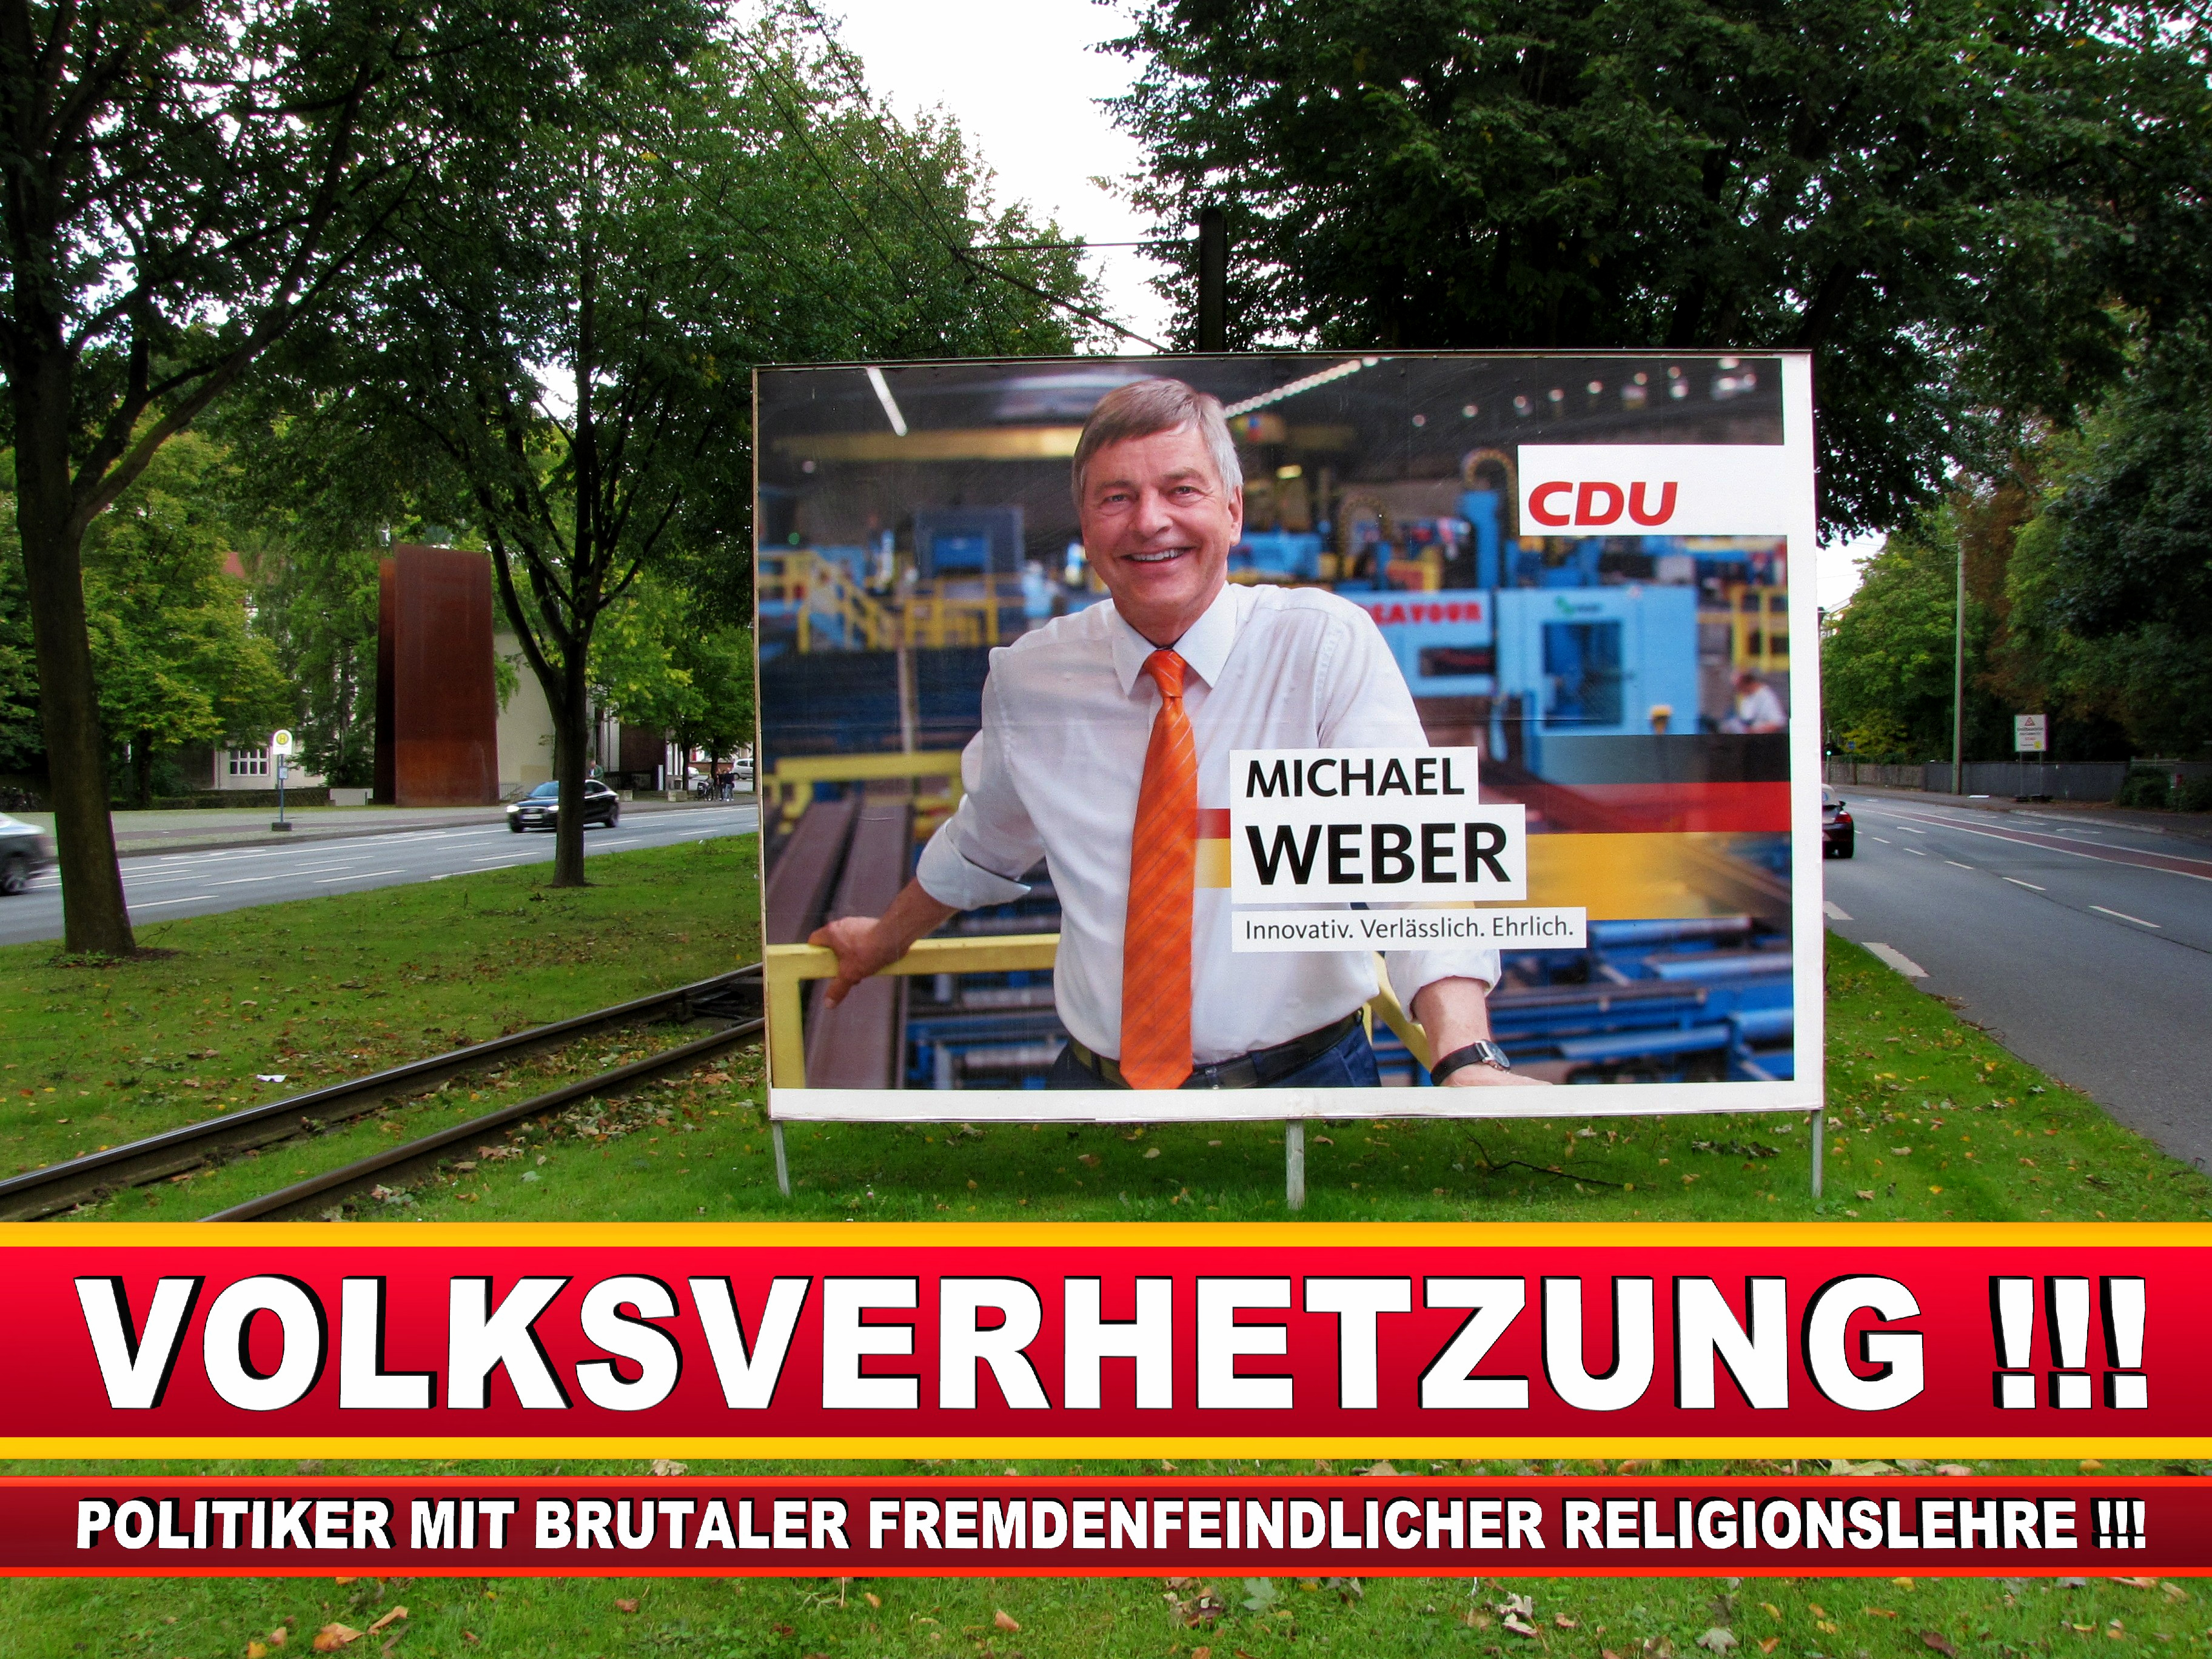 Michael Weber CDU Wahlplakat Wahlwerbung Bielefeld Volksverhetzung Durch Religion (6)